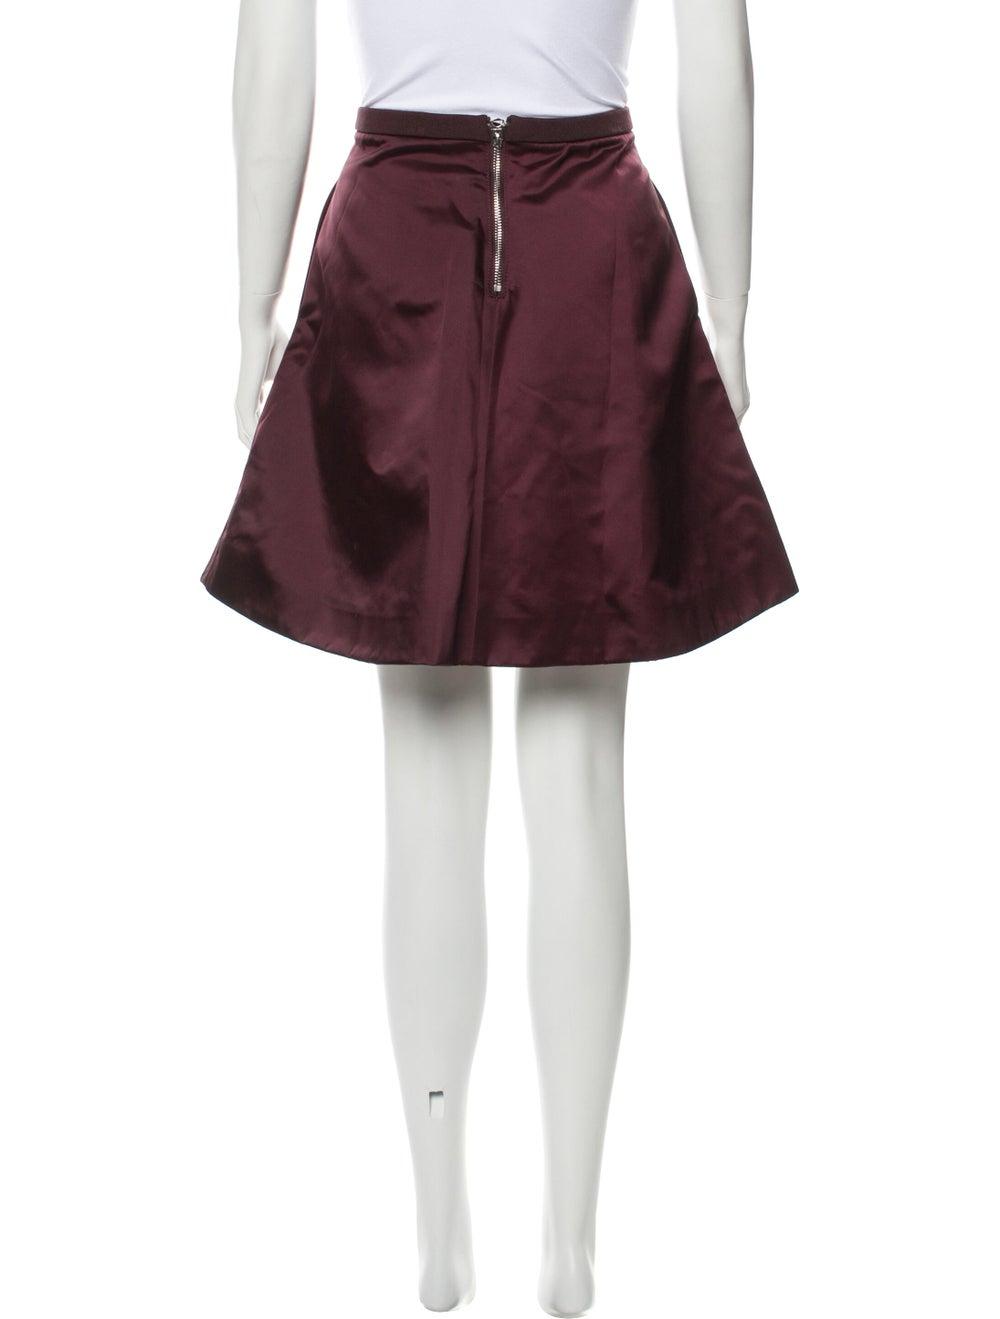 Acne Studios 2015 Mini Skirt - image 3